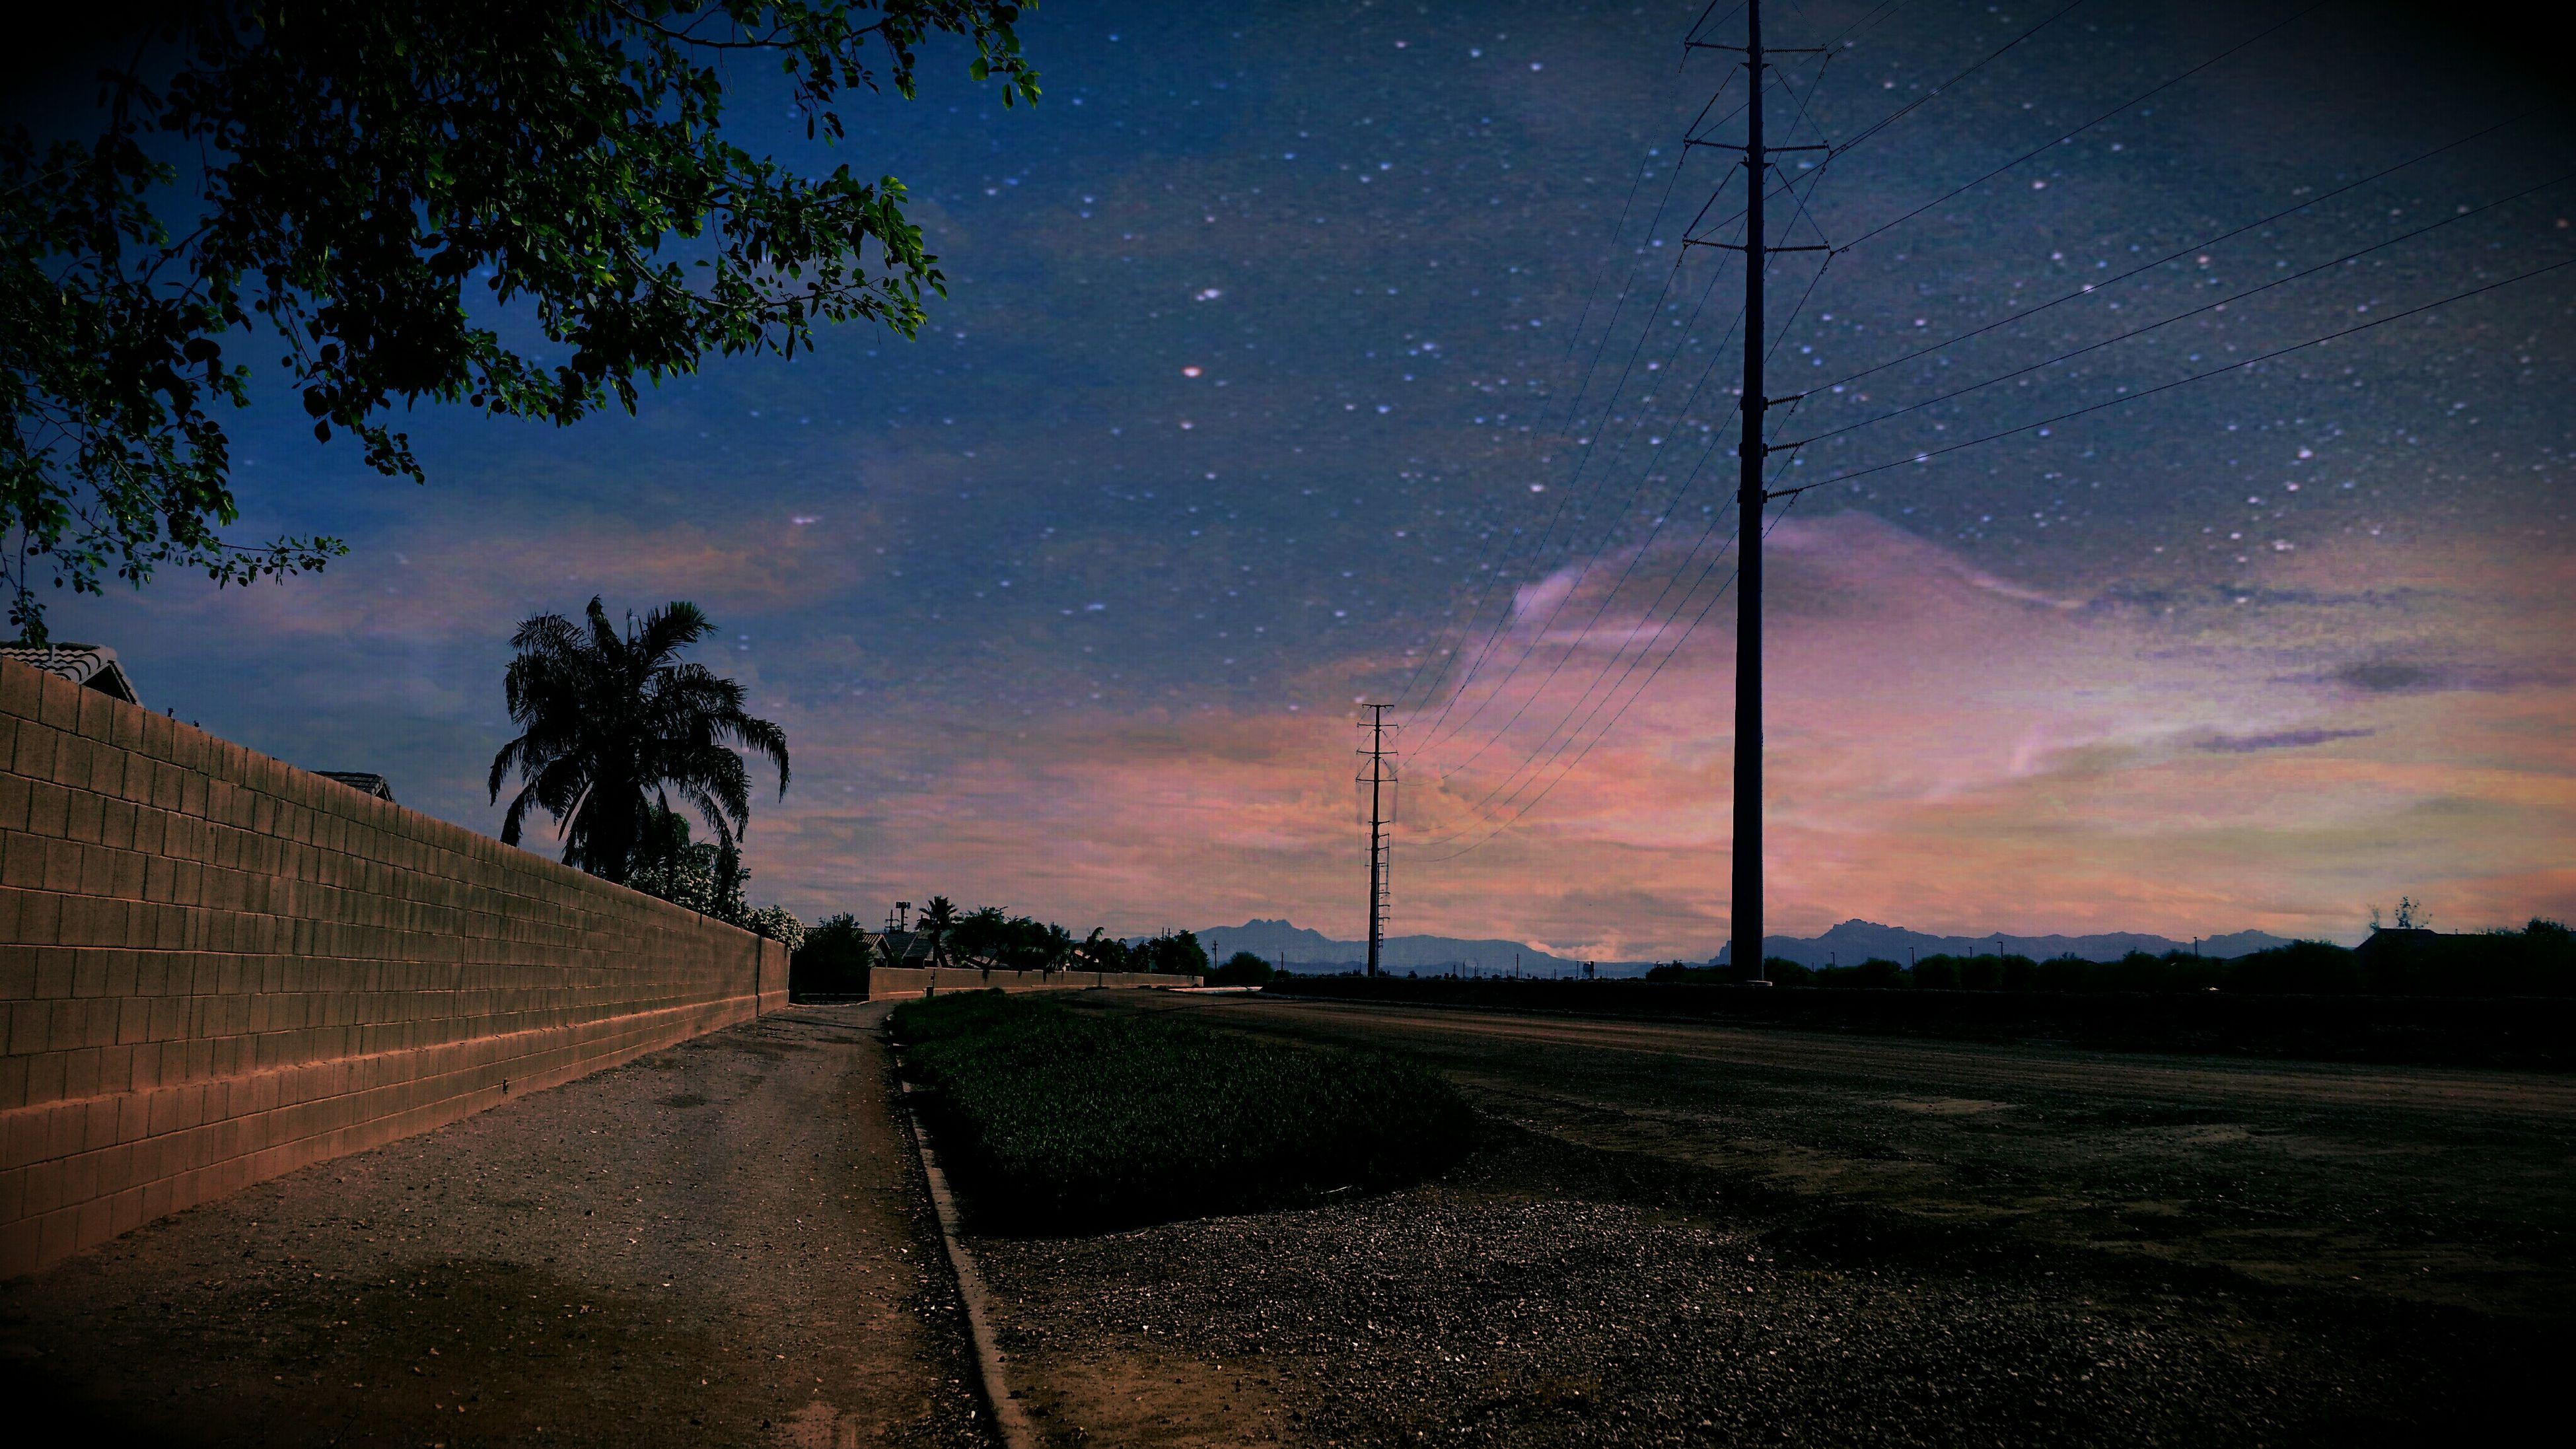 sky, road, the way forward, night, cloud - sky, landscape, street, transportation, street light, tree, illuminated, nature, sunset, tranquility, scenics, field, empty road, road marking, tranquil scene, outdoors